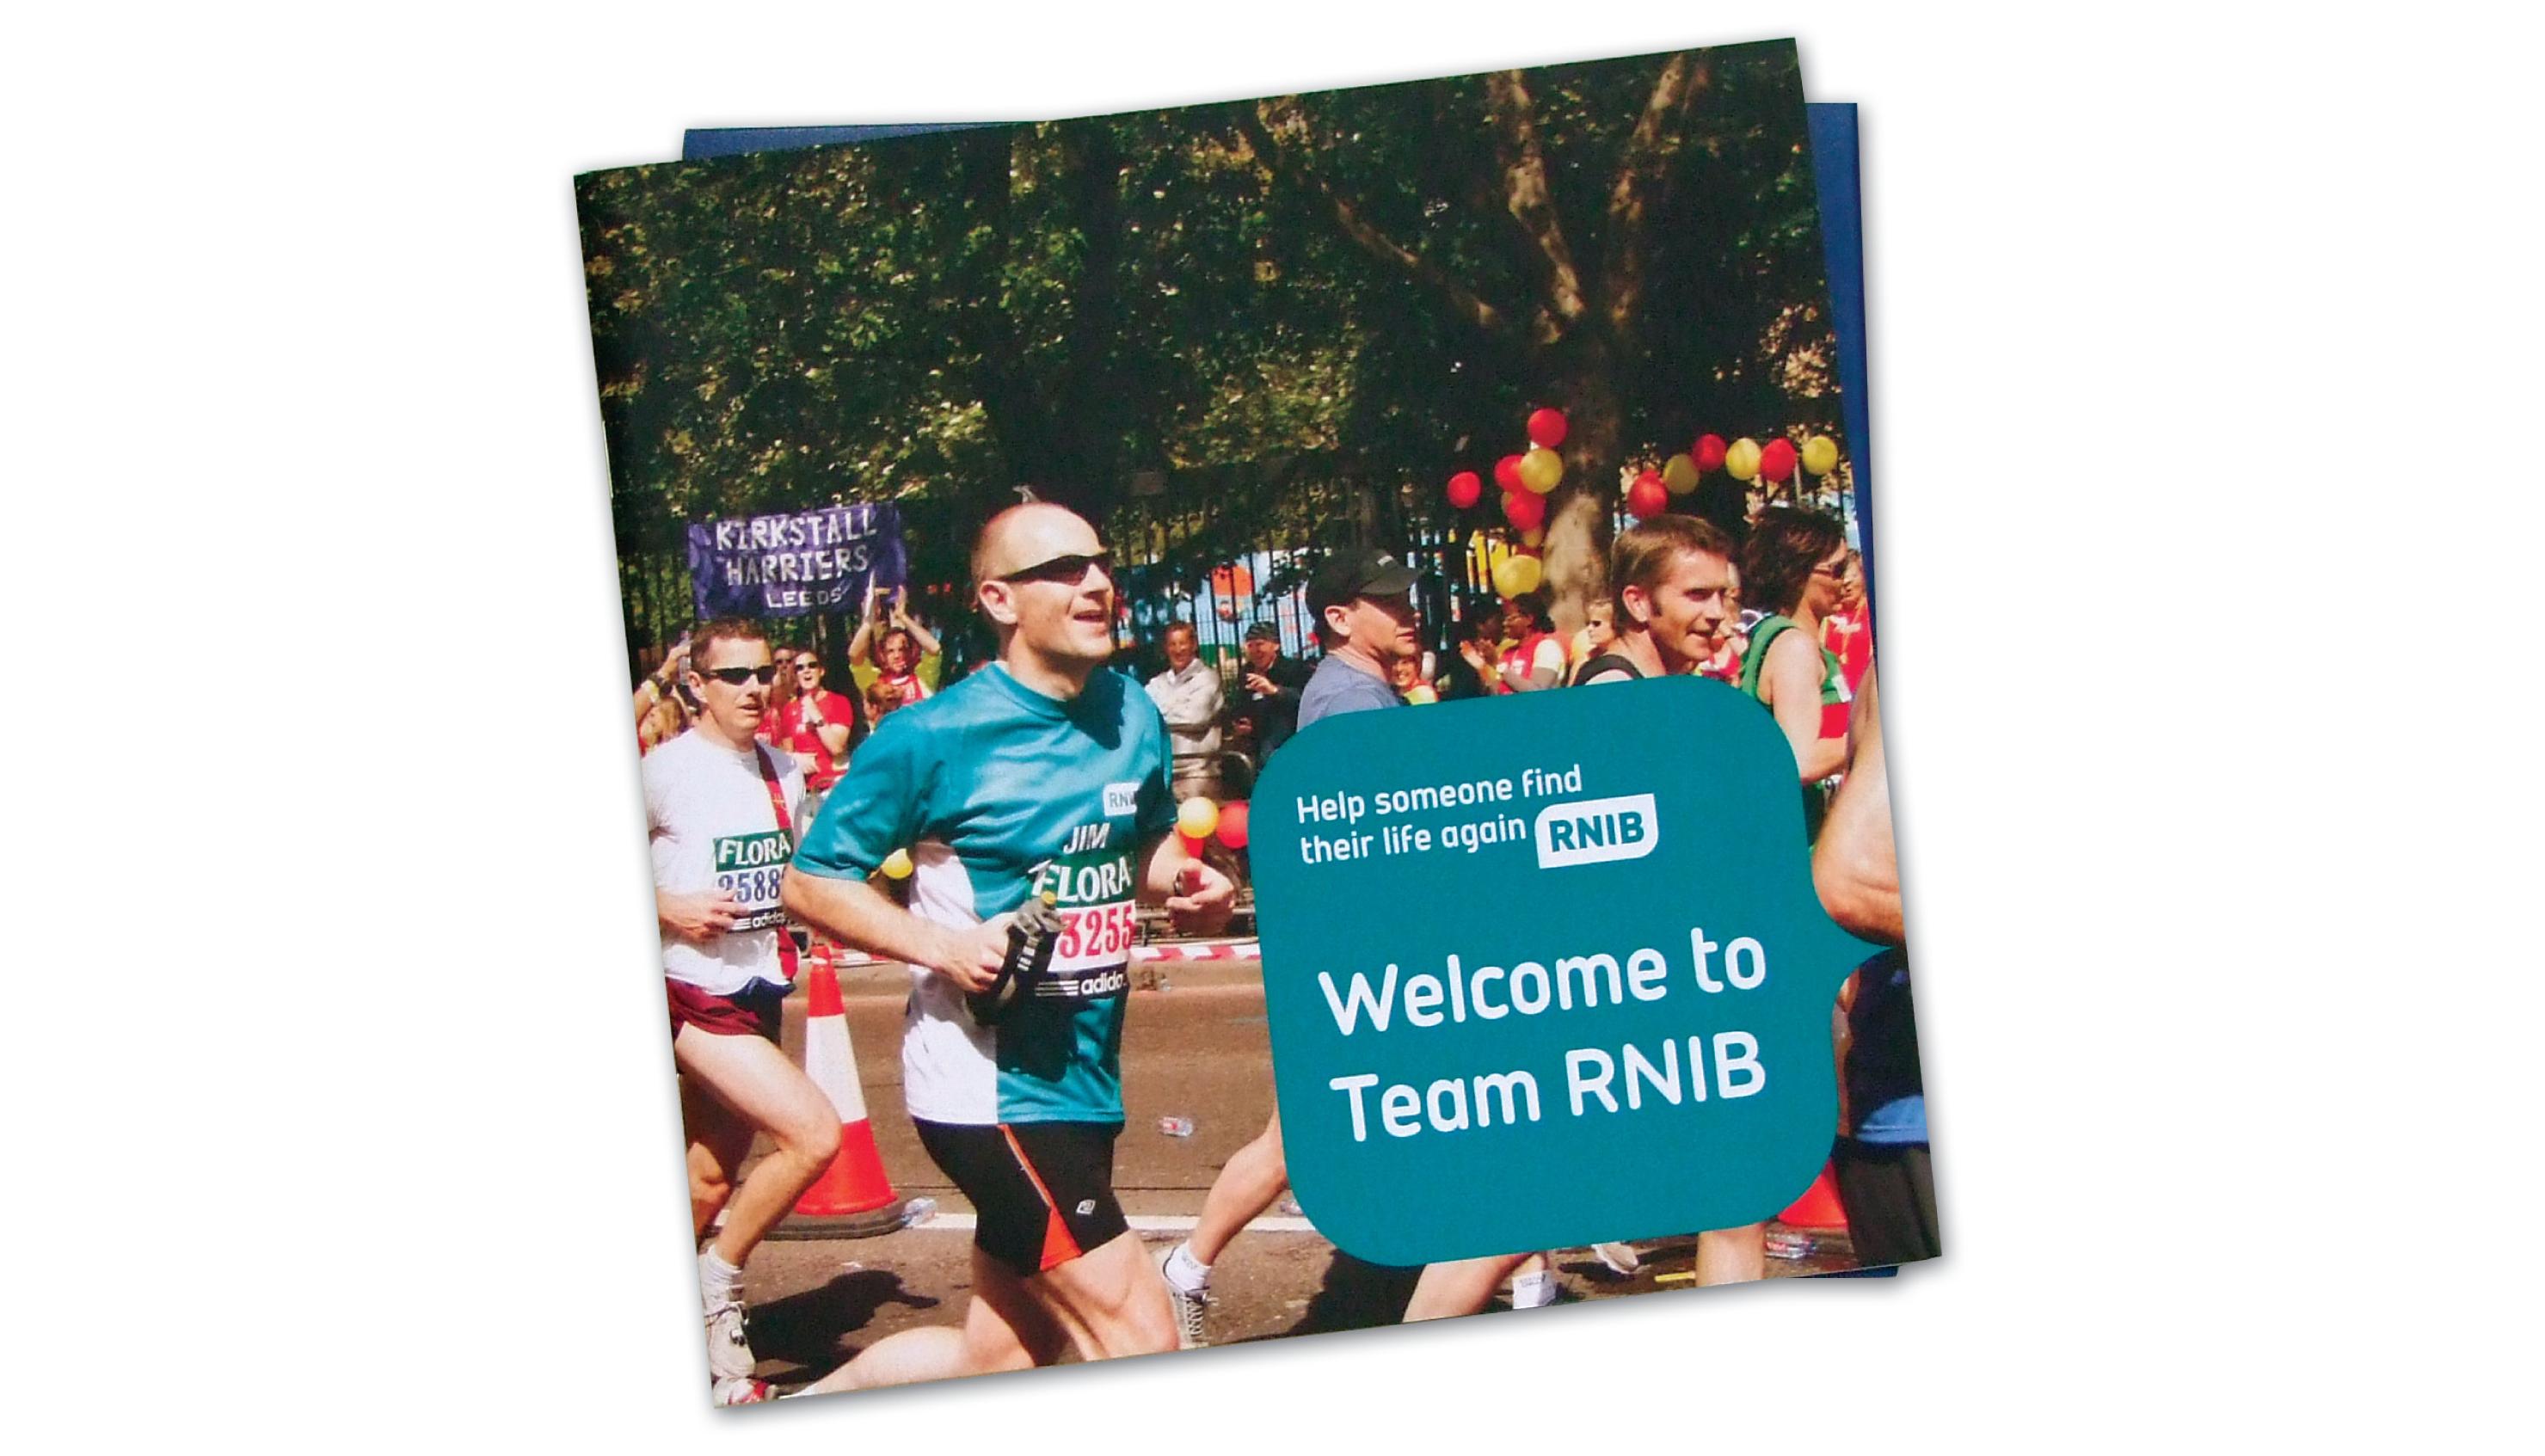 RNIB fundraiser's pack